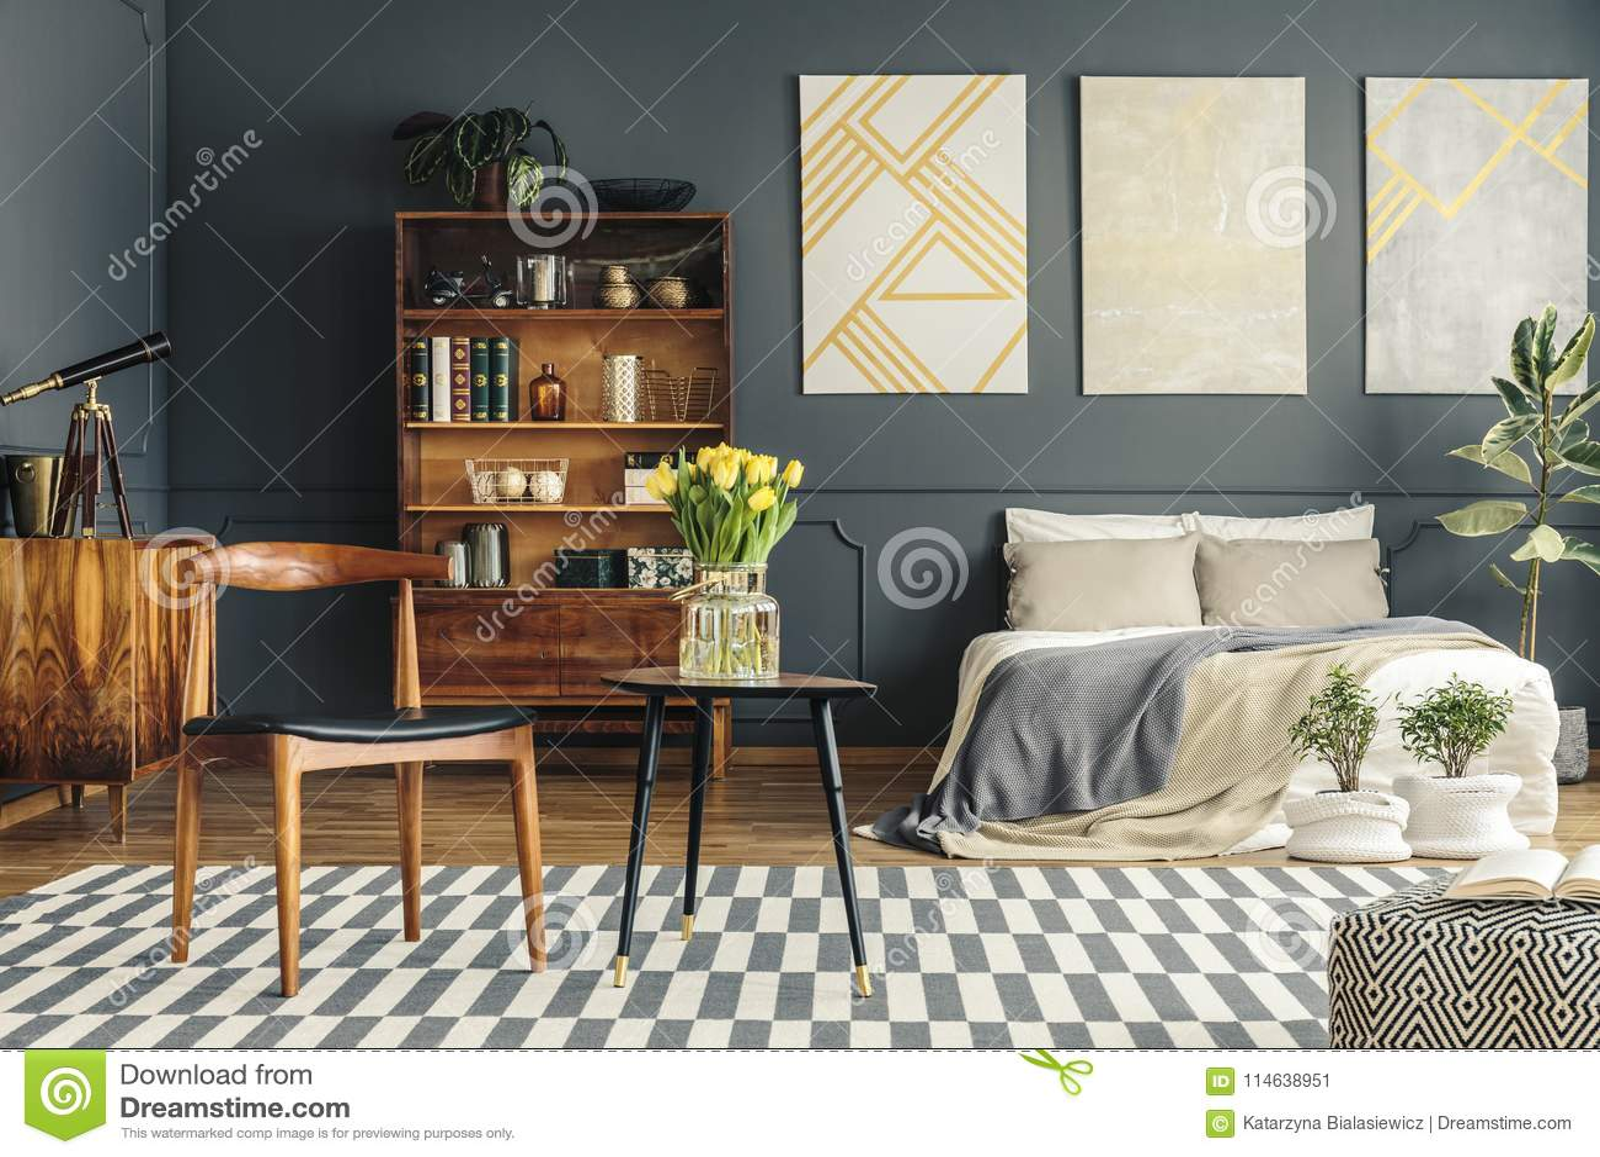 Retro bedroom interior stock image. Image of black, bookcase - 114638951